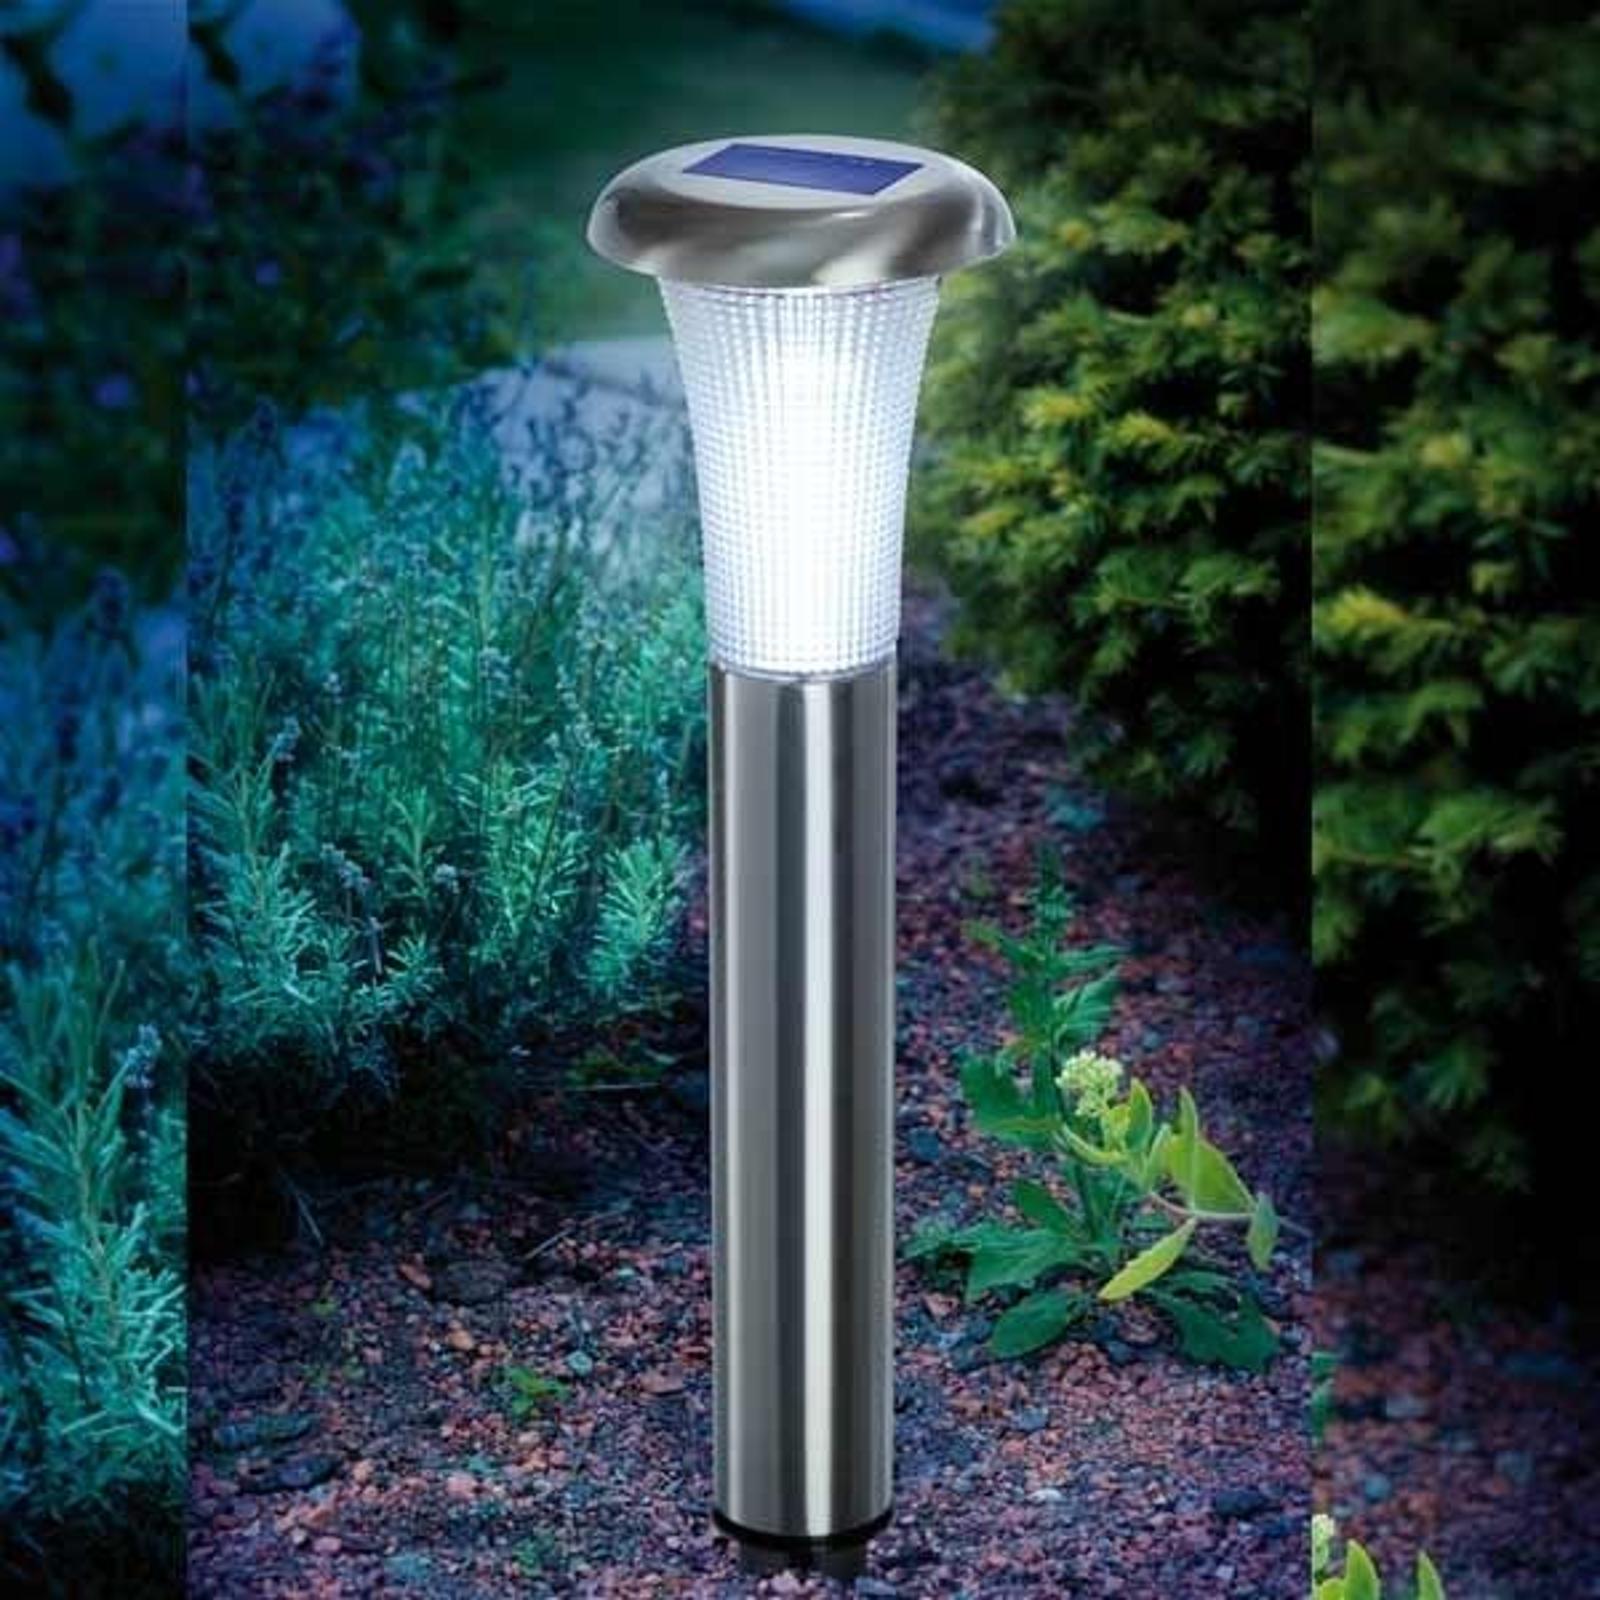 Vesuv LED-Solarleuchte Edelstahl